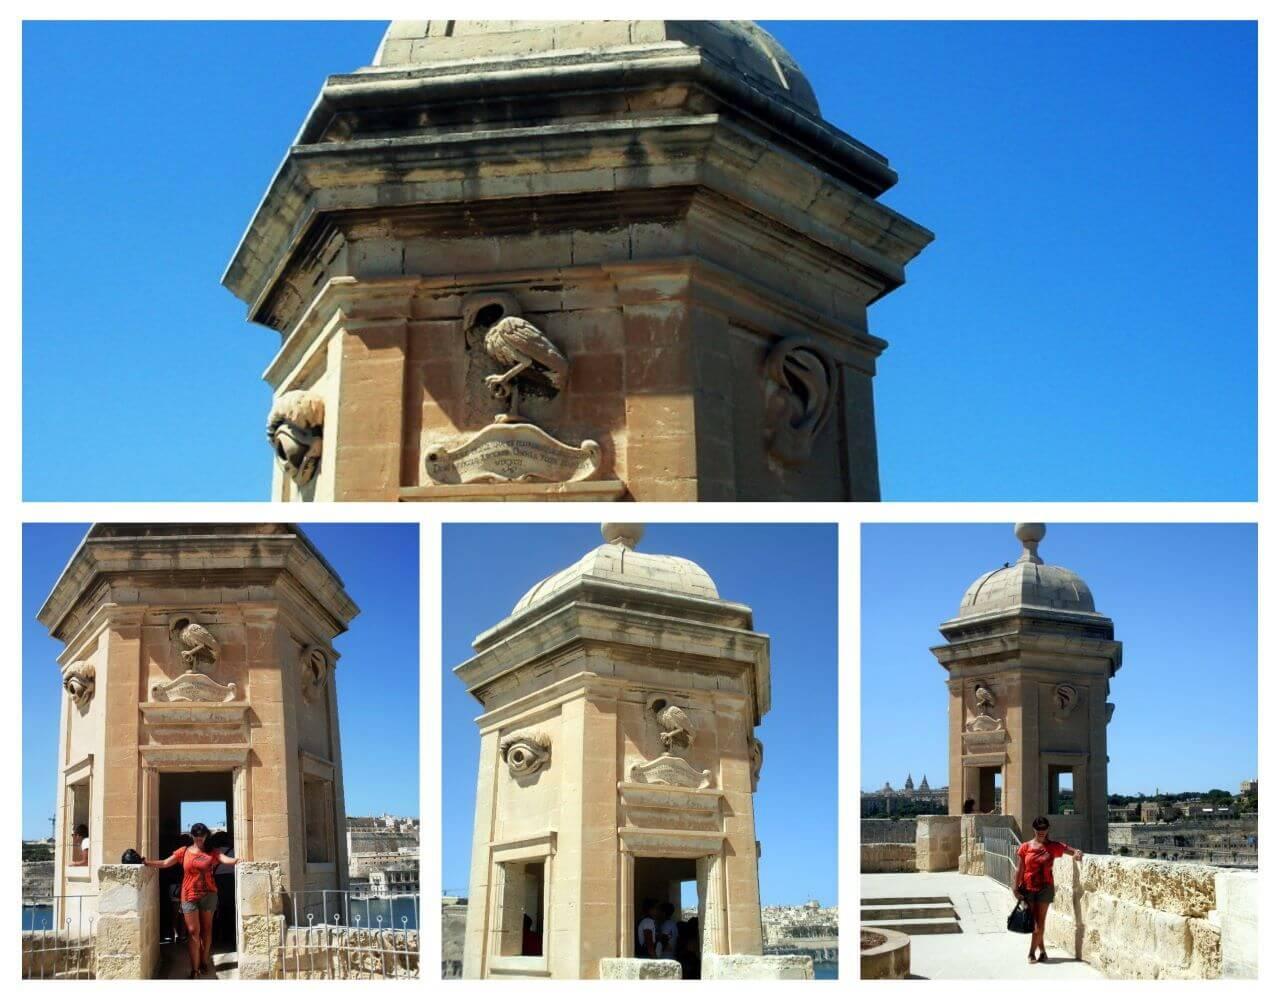 Gardjola watchtower, Senglea, Three cities, Malta, Tri grada